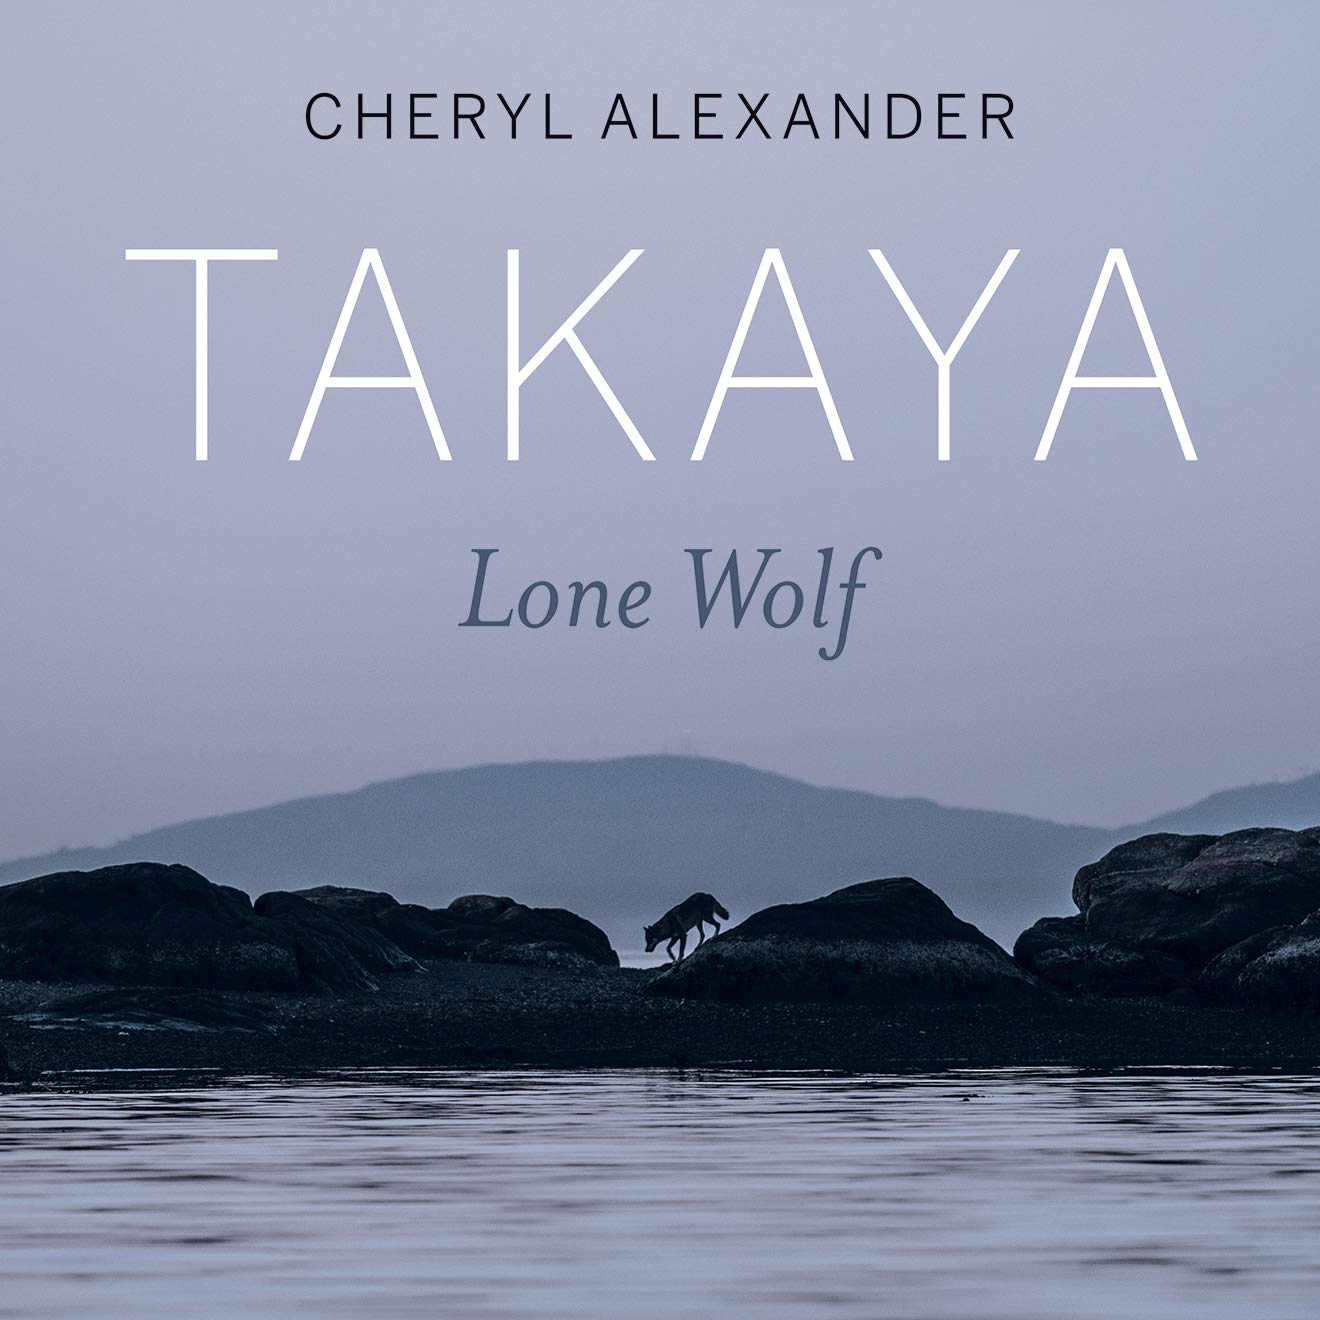 Takaya: Lone Wolf: Alexander, Cheryl: 9781771603737: Books - Amazon.ca